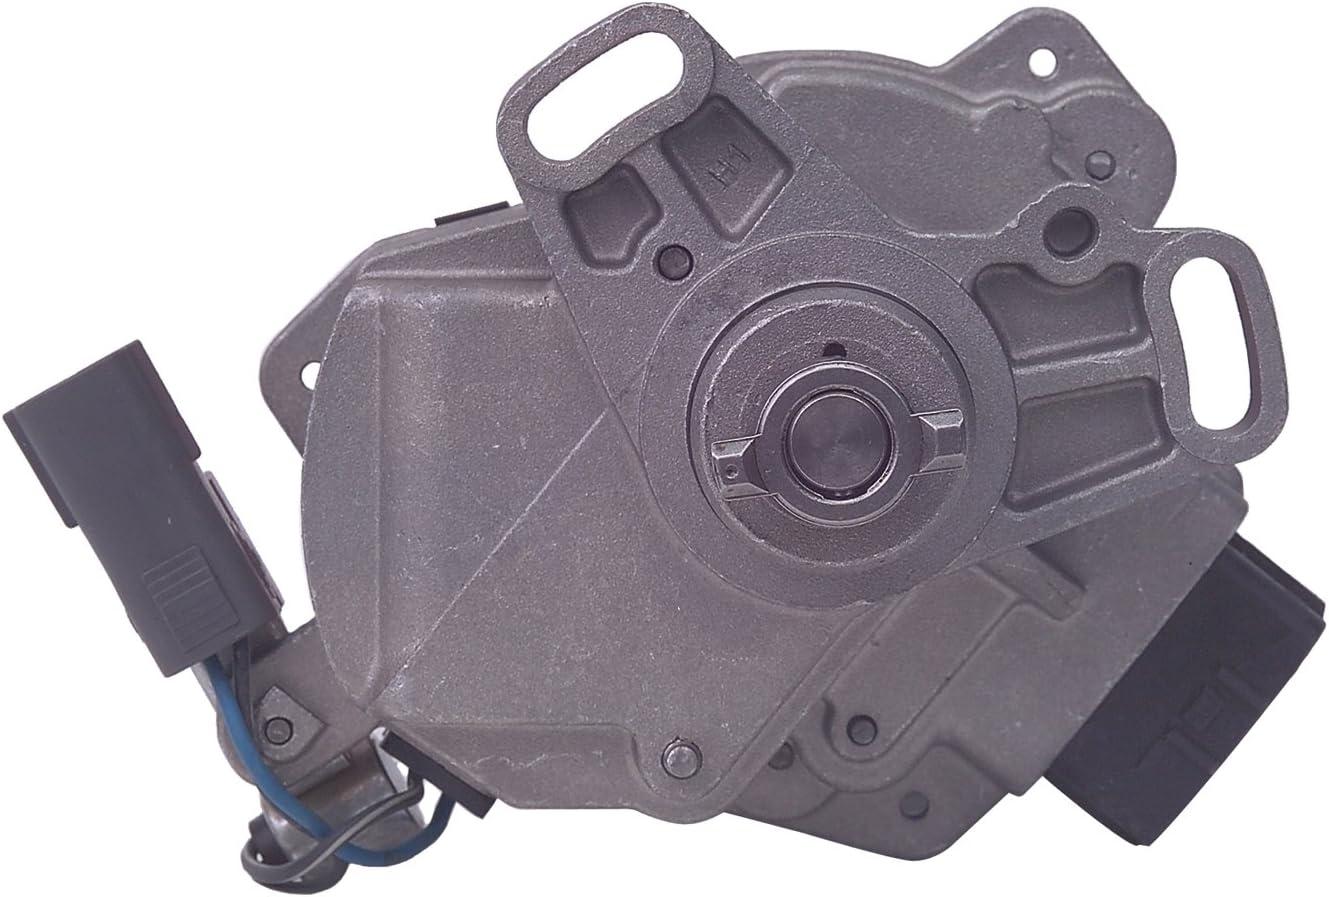 Cardone 31-58460 Remanufactured Import Distributor